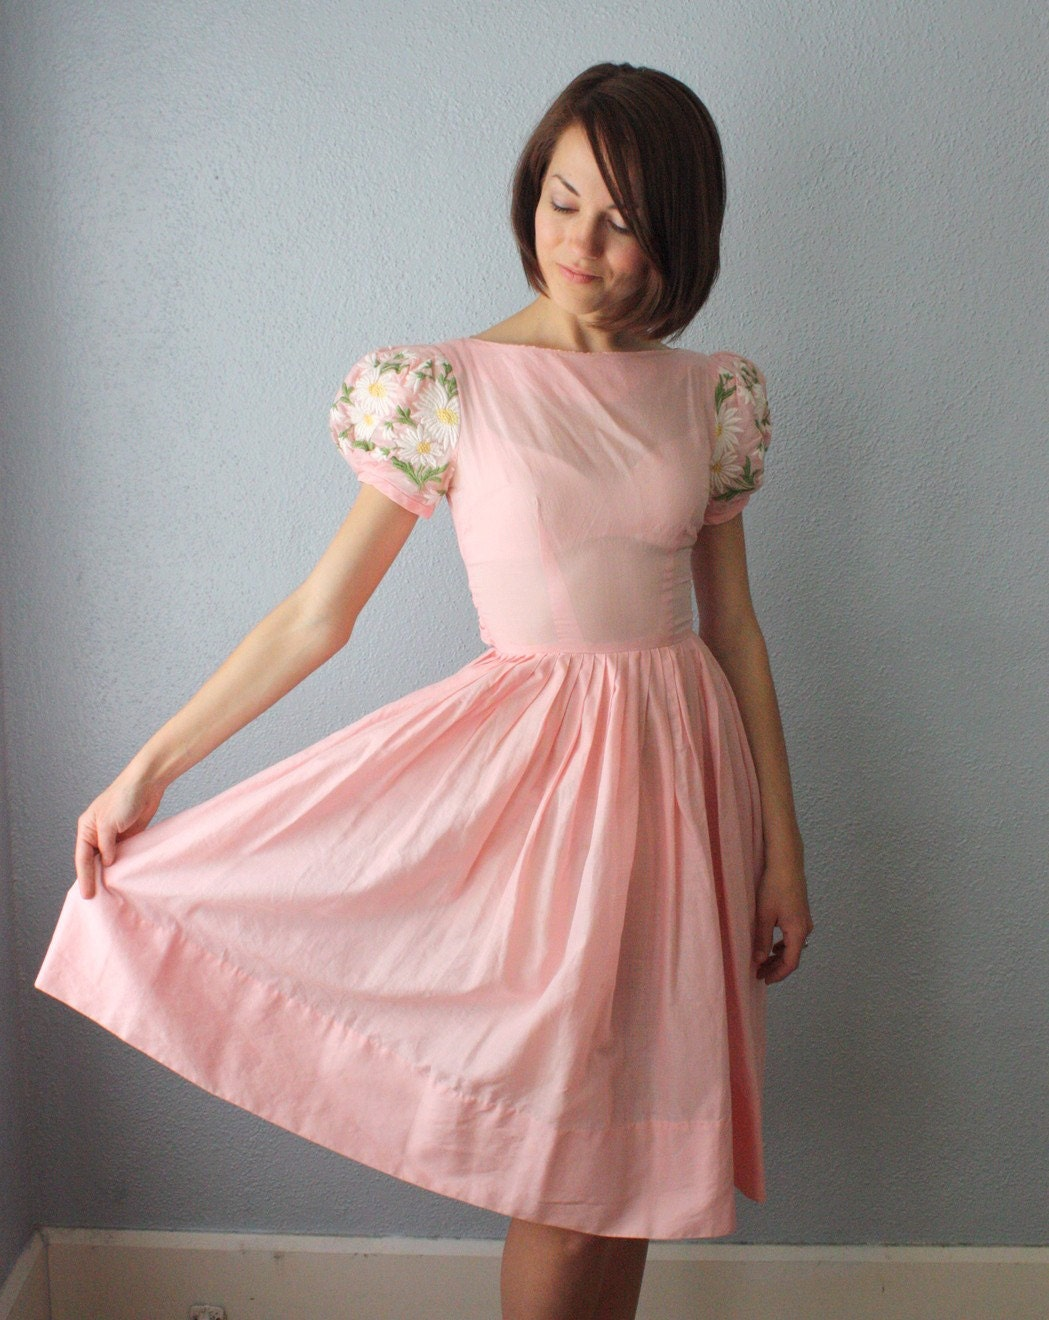 vintage 1950's pink party dress